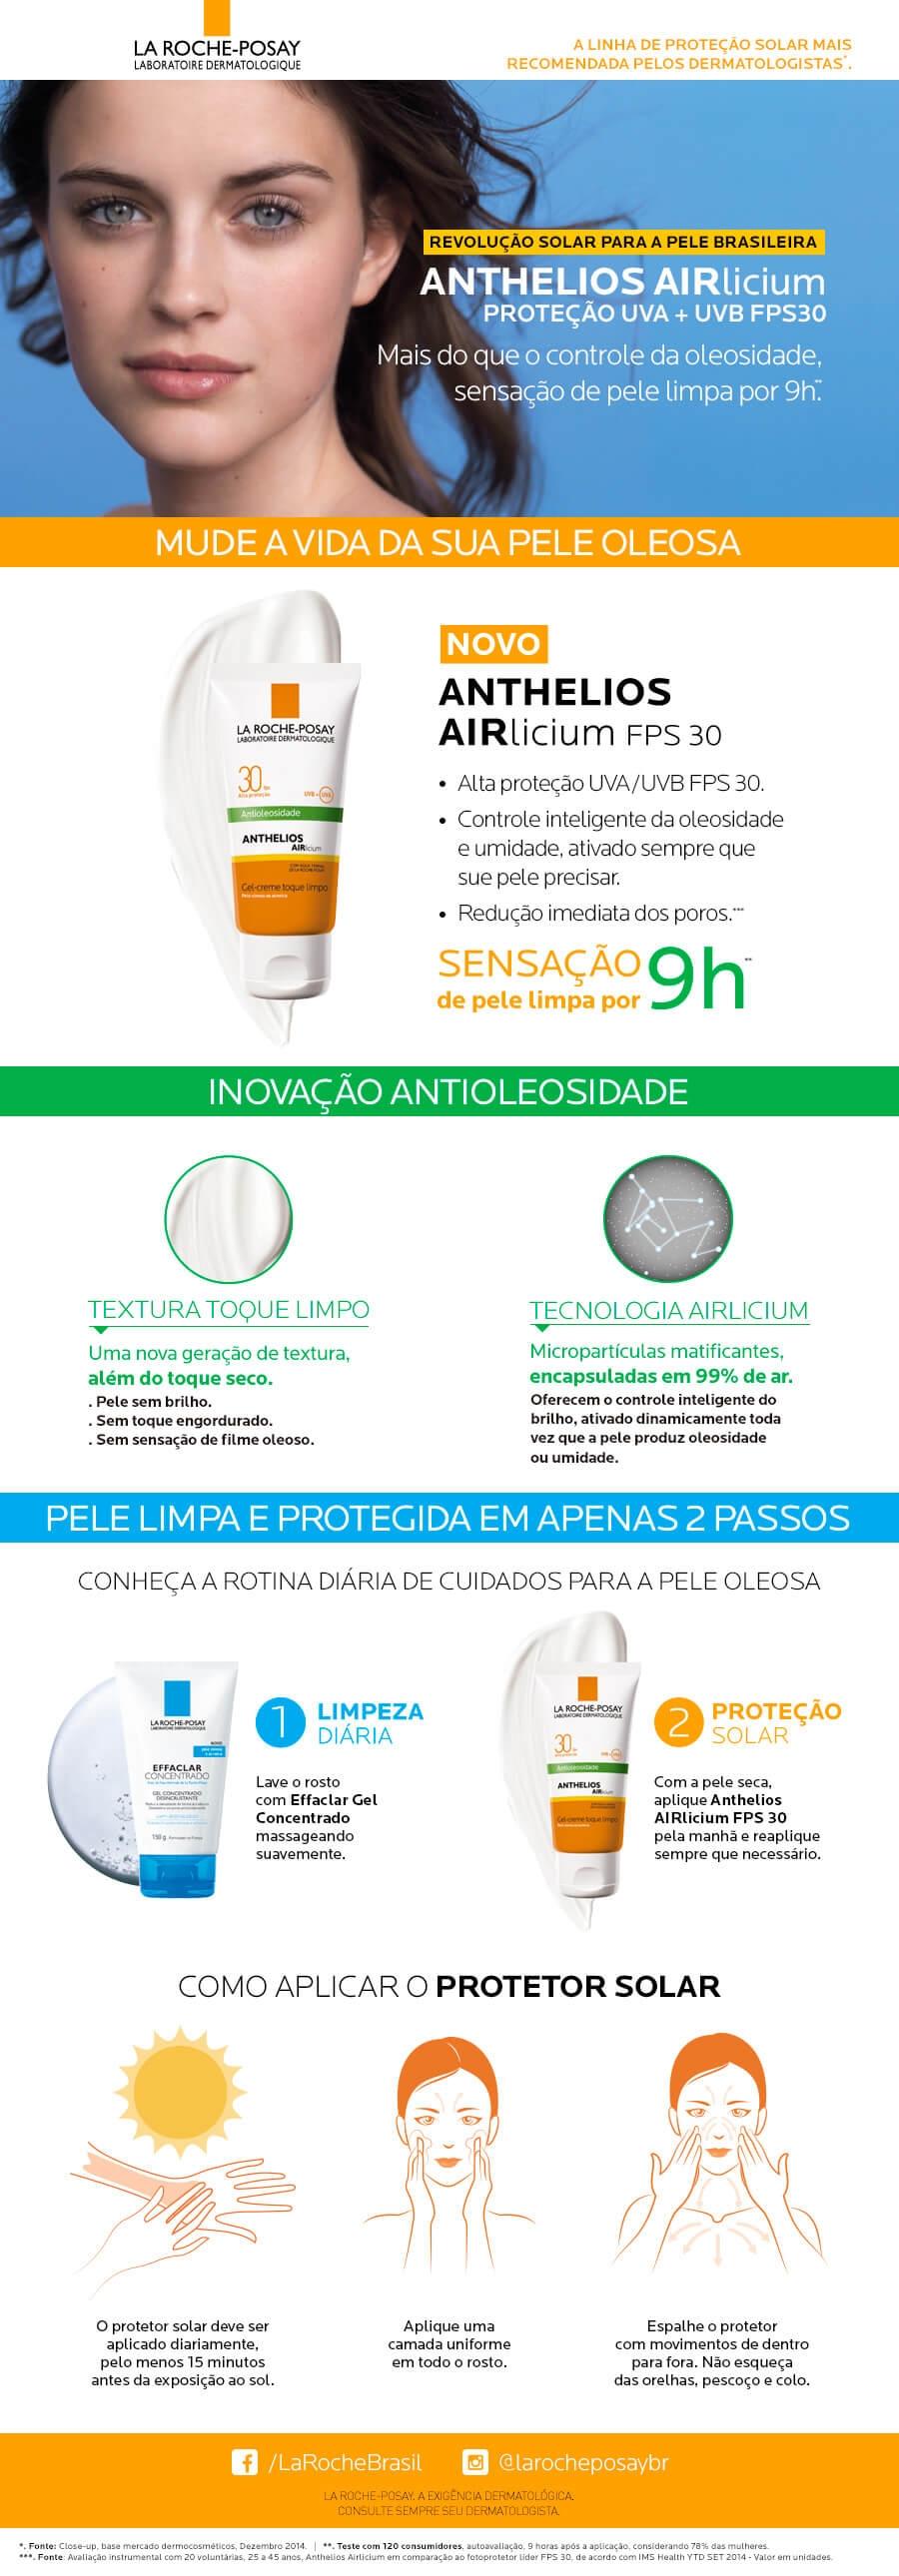 Lamina Protetor Solar Facial Anthelios Aircilium F30